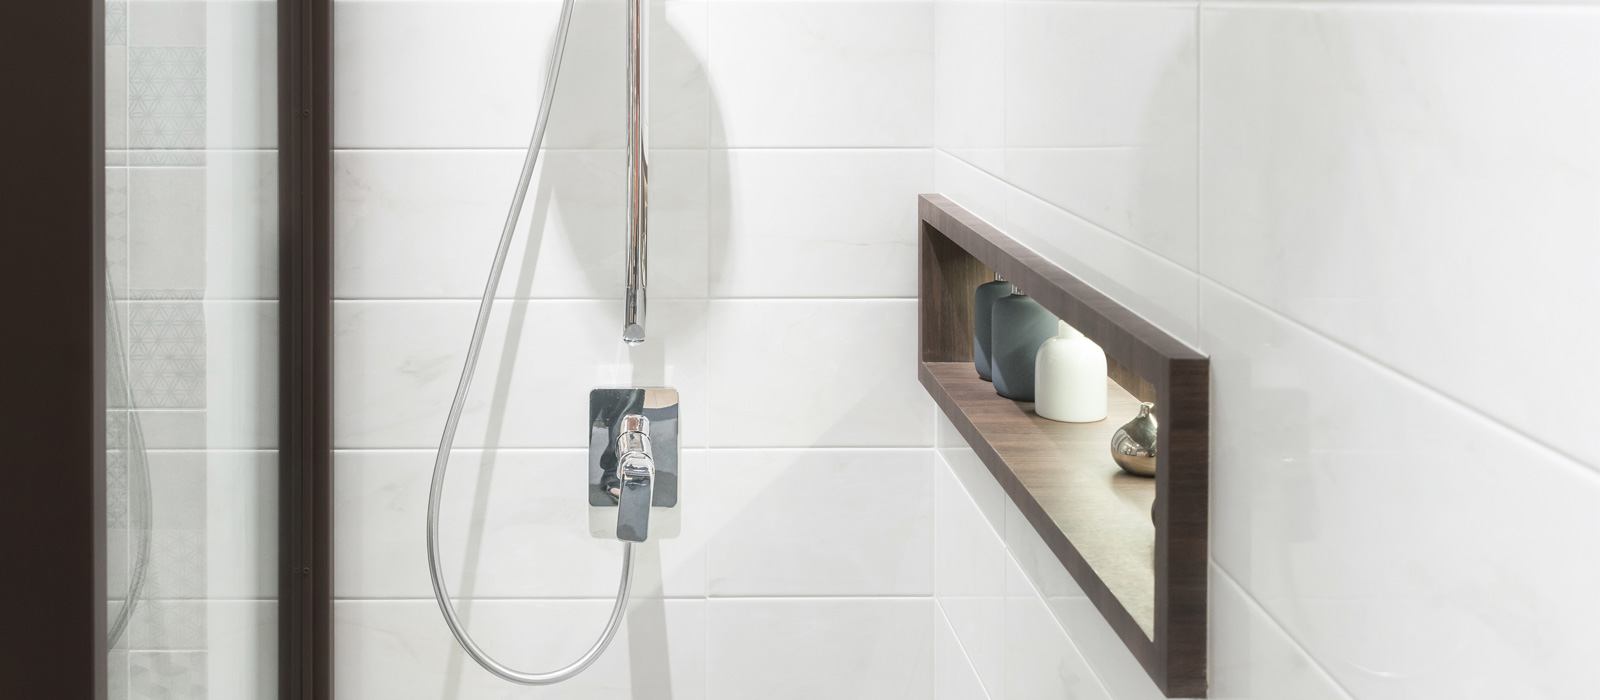 Tub Shower Surrounds Hardsurfacessolutions